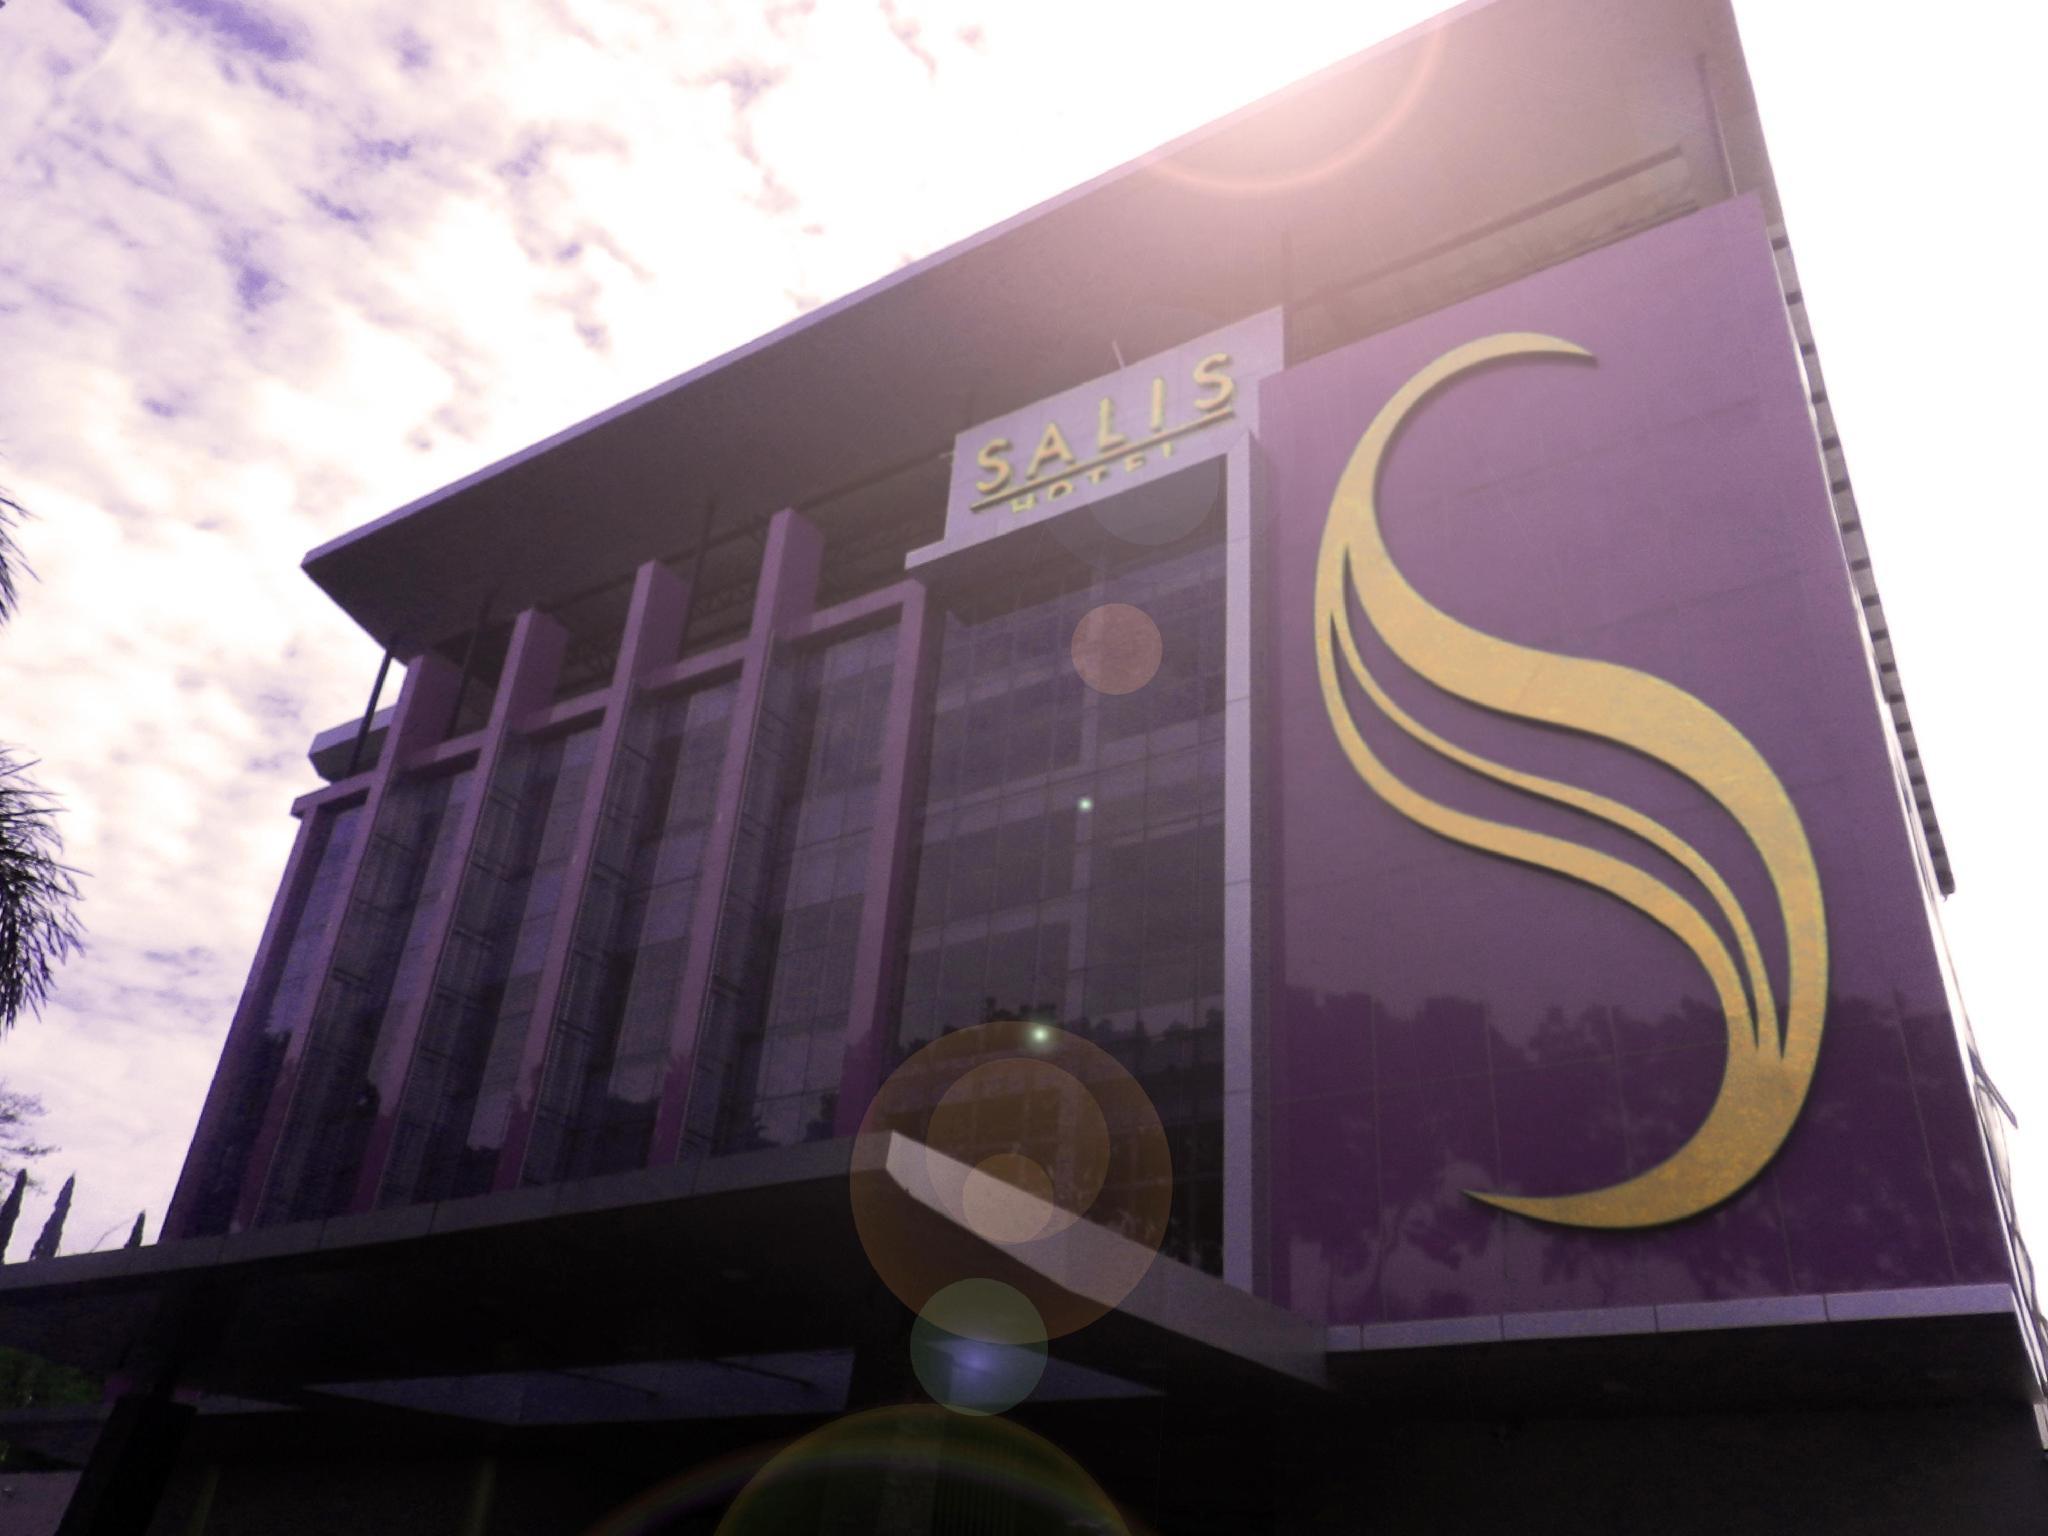 The Salis Hotel Setiabudi, Bandung